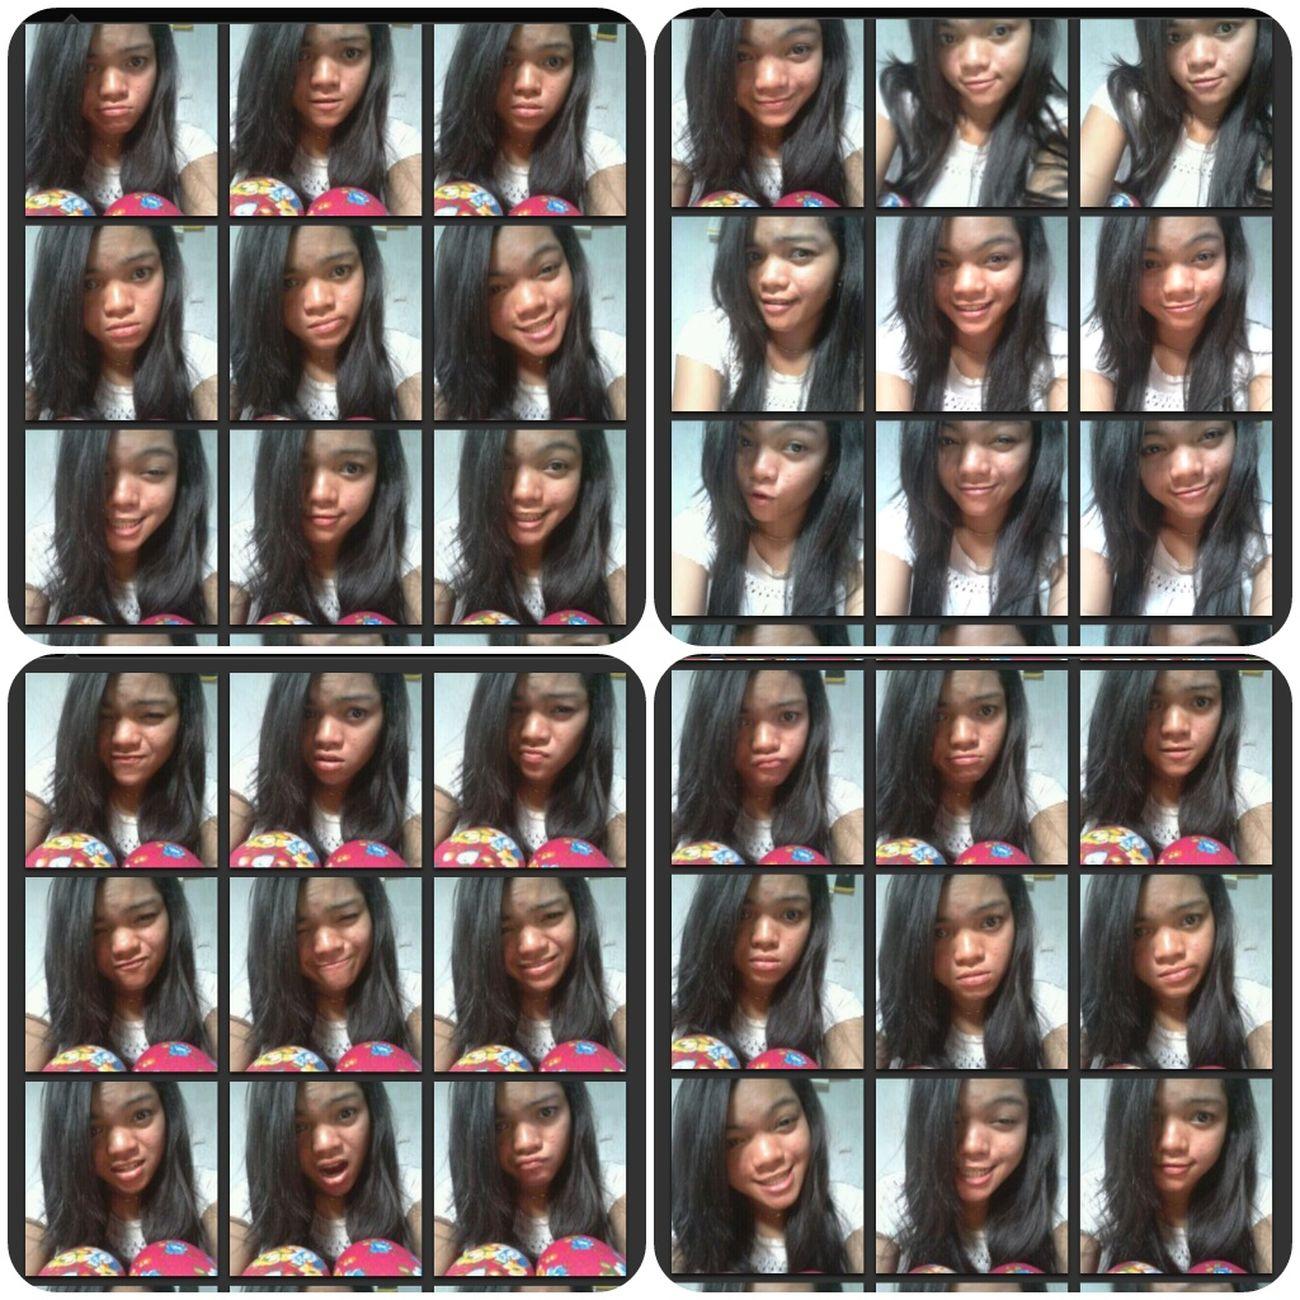 Me_selfie_originalcam_no_edit